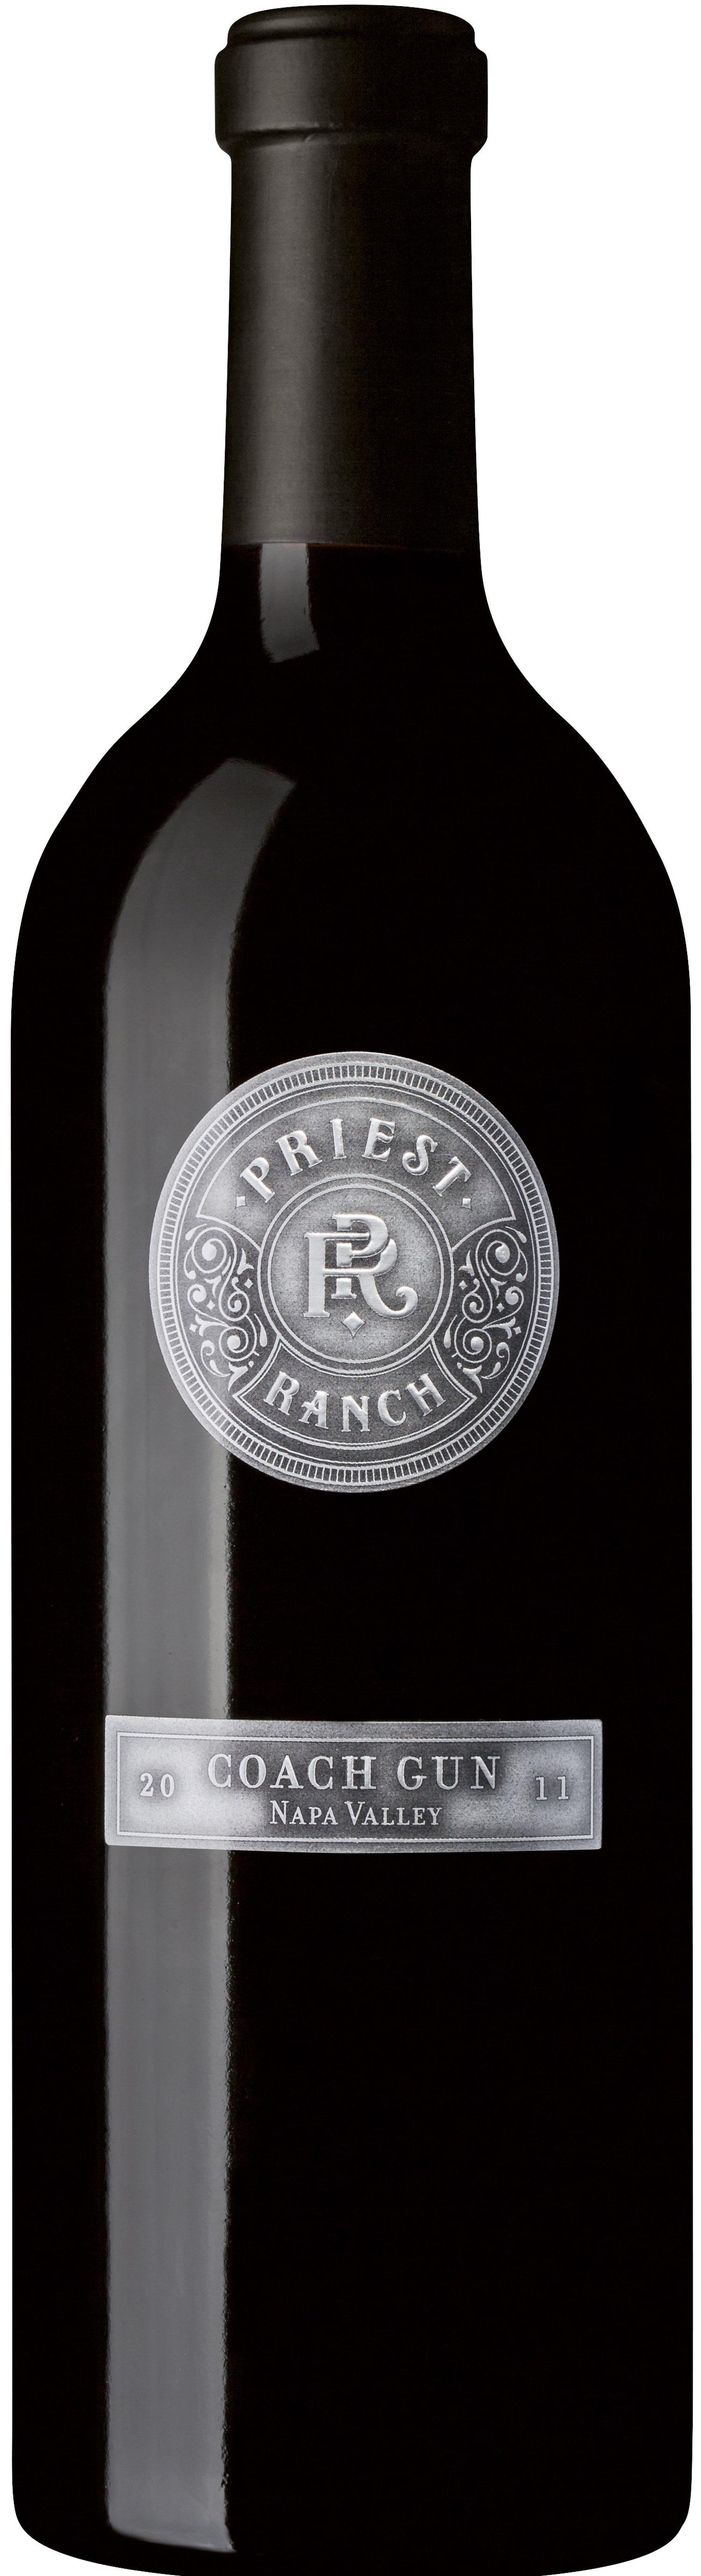 Priest Ranch – Coach Gun, Napa